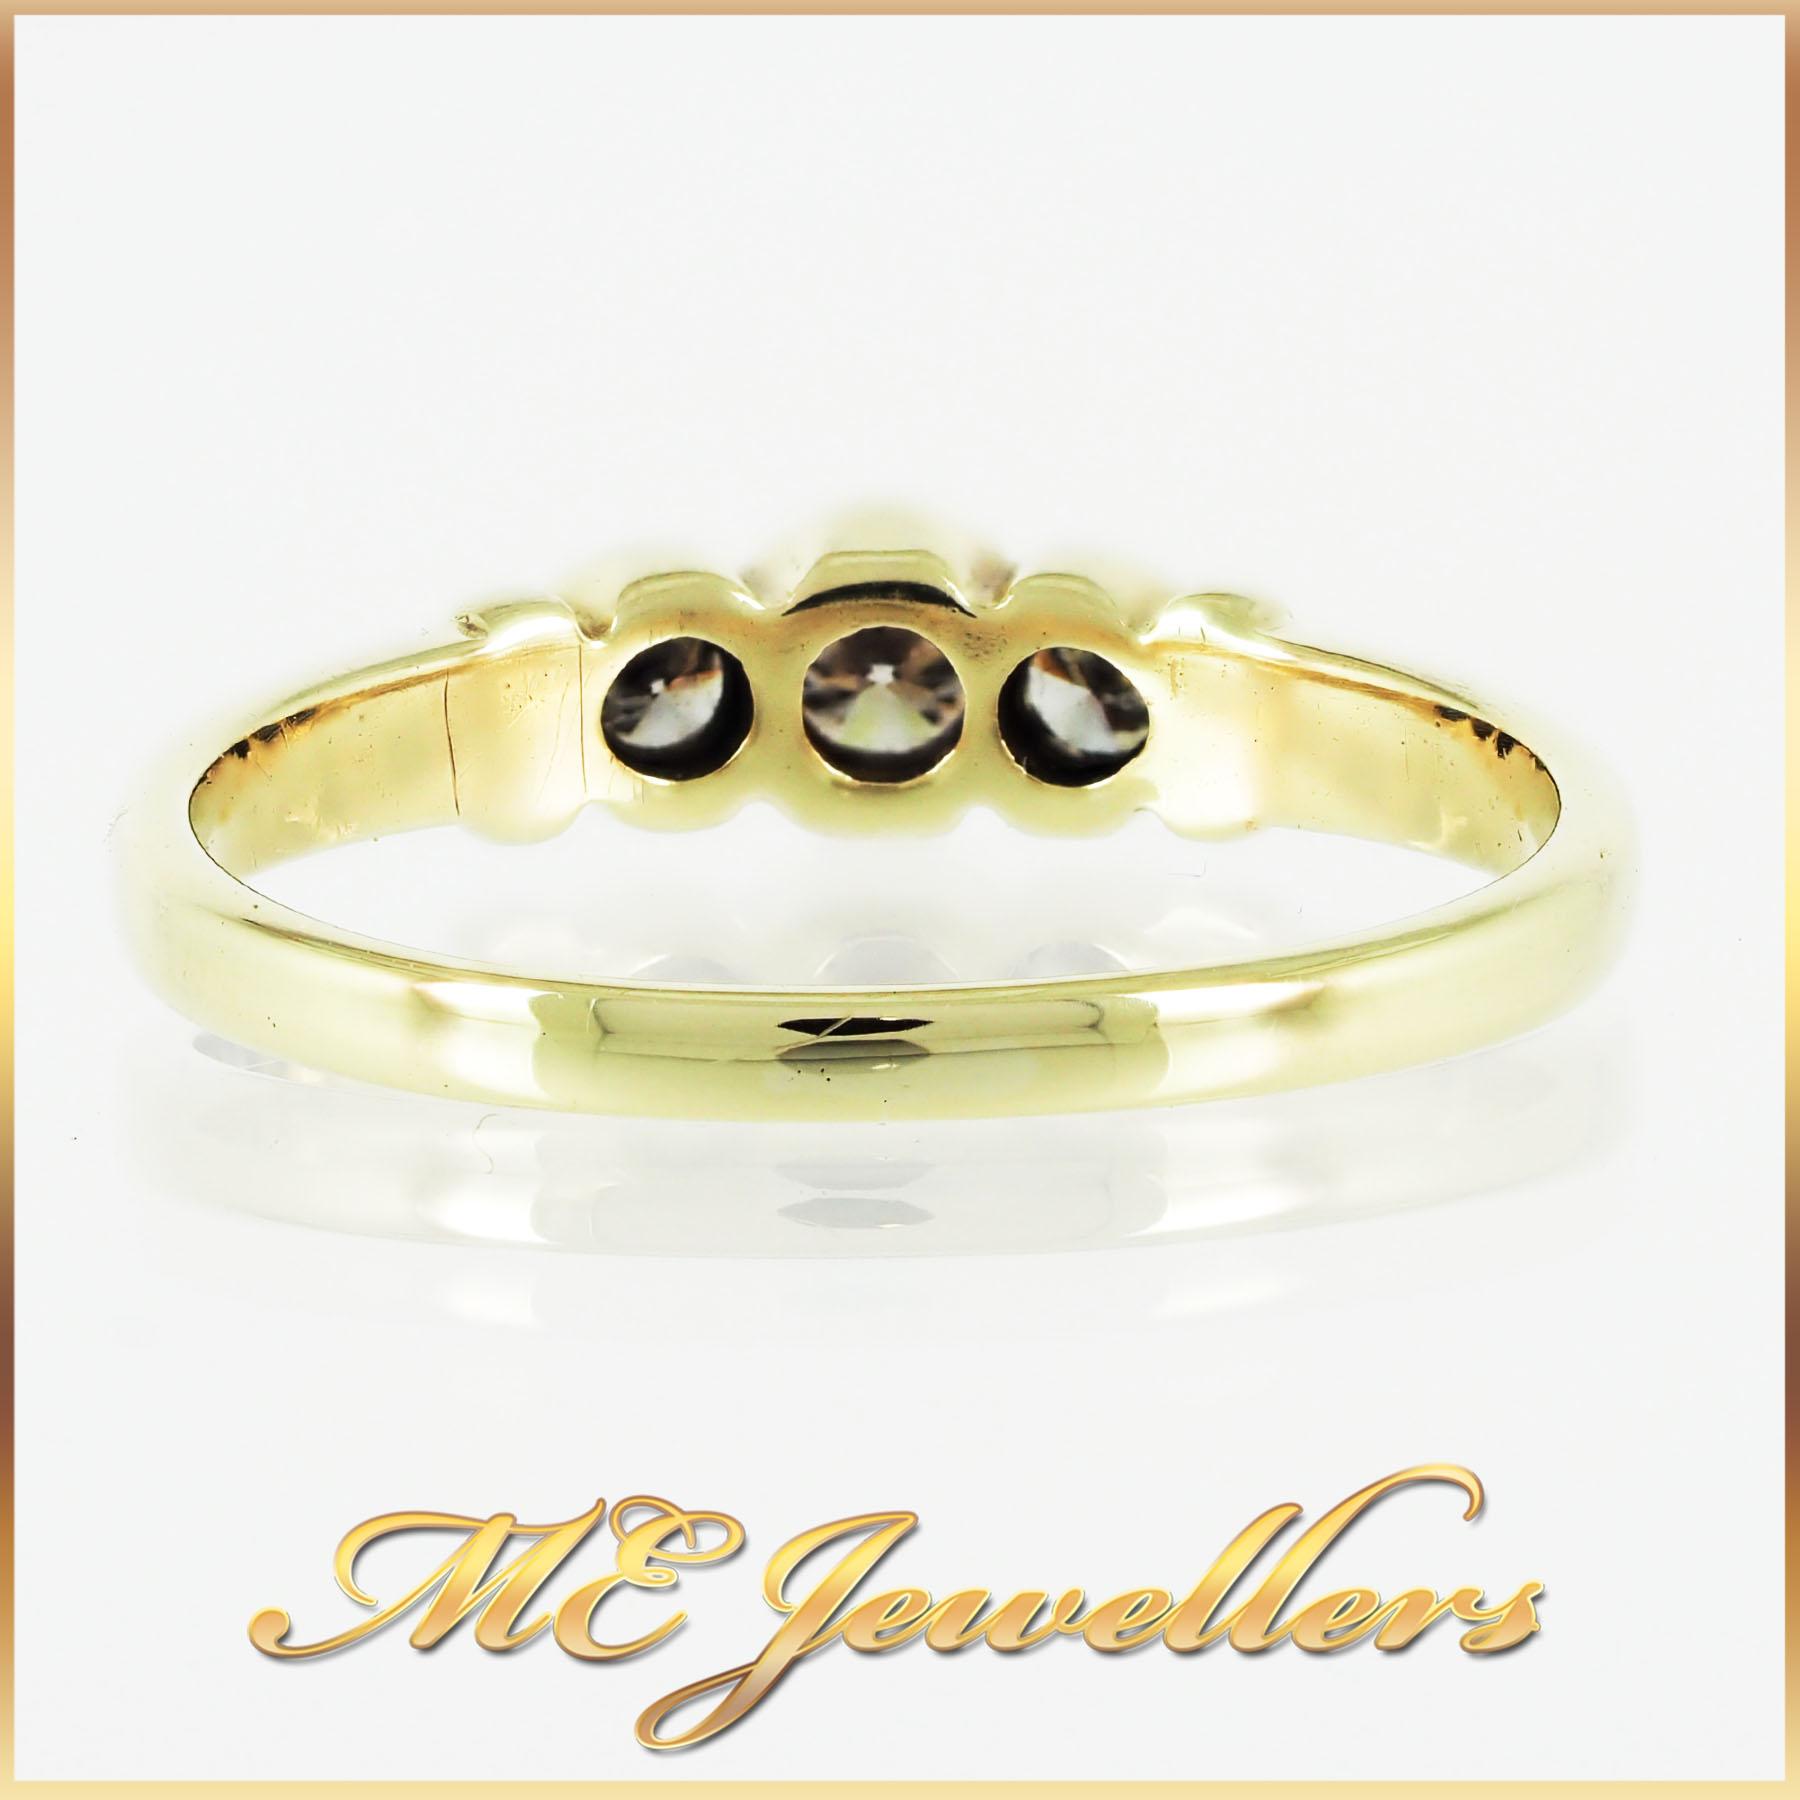 313 Trilogy Diamond Ring 9K Yellow Gold (2)